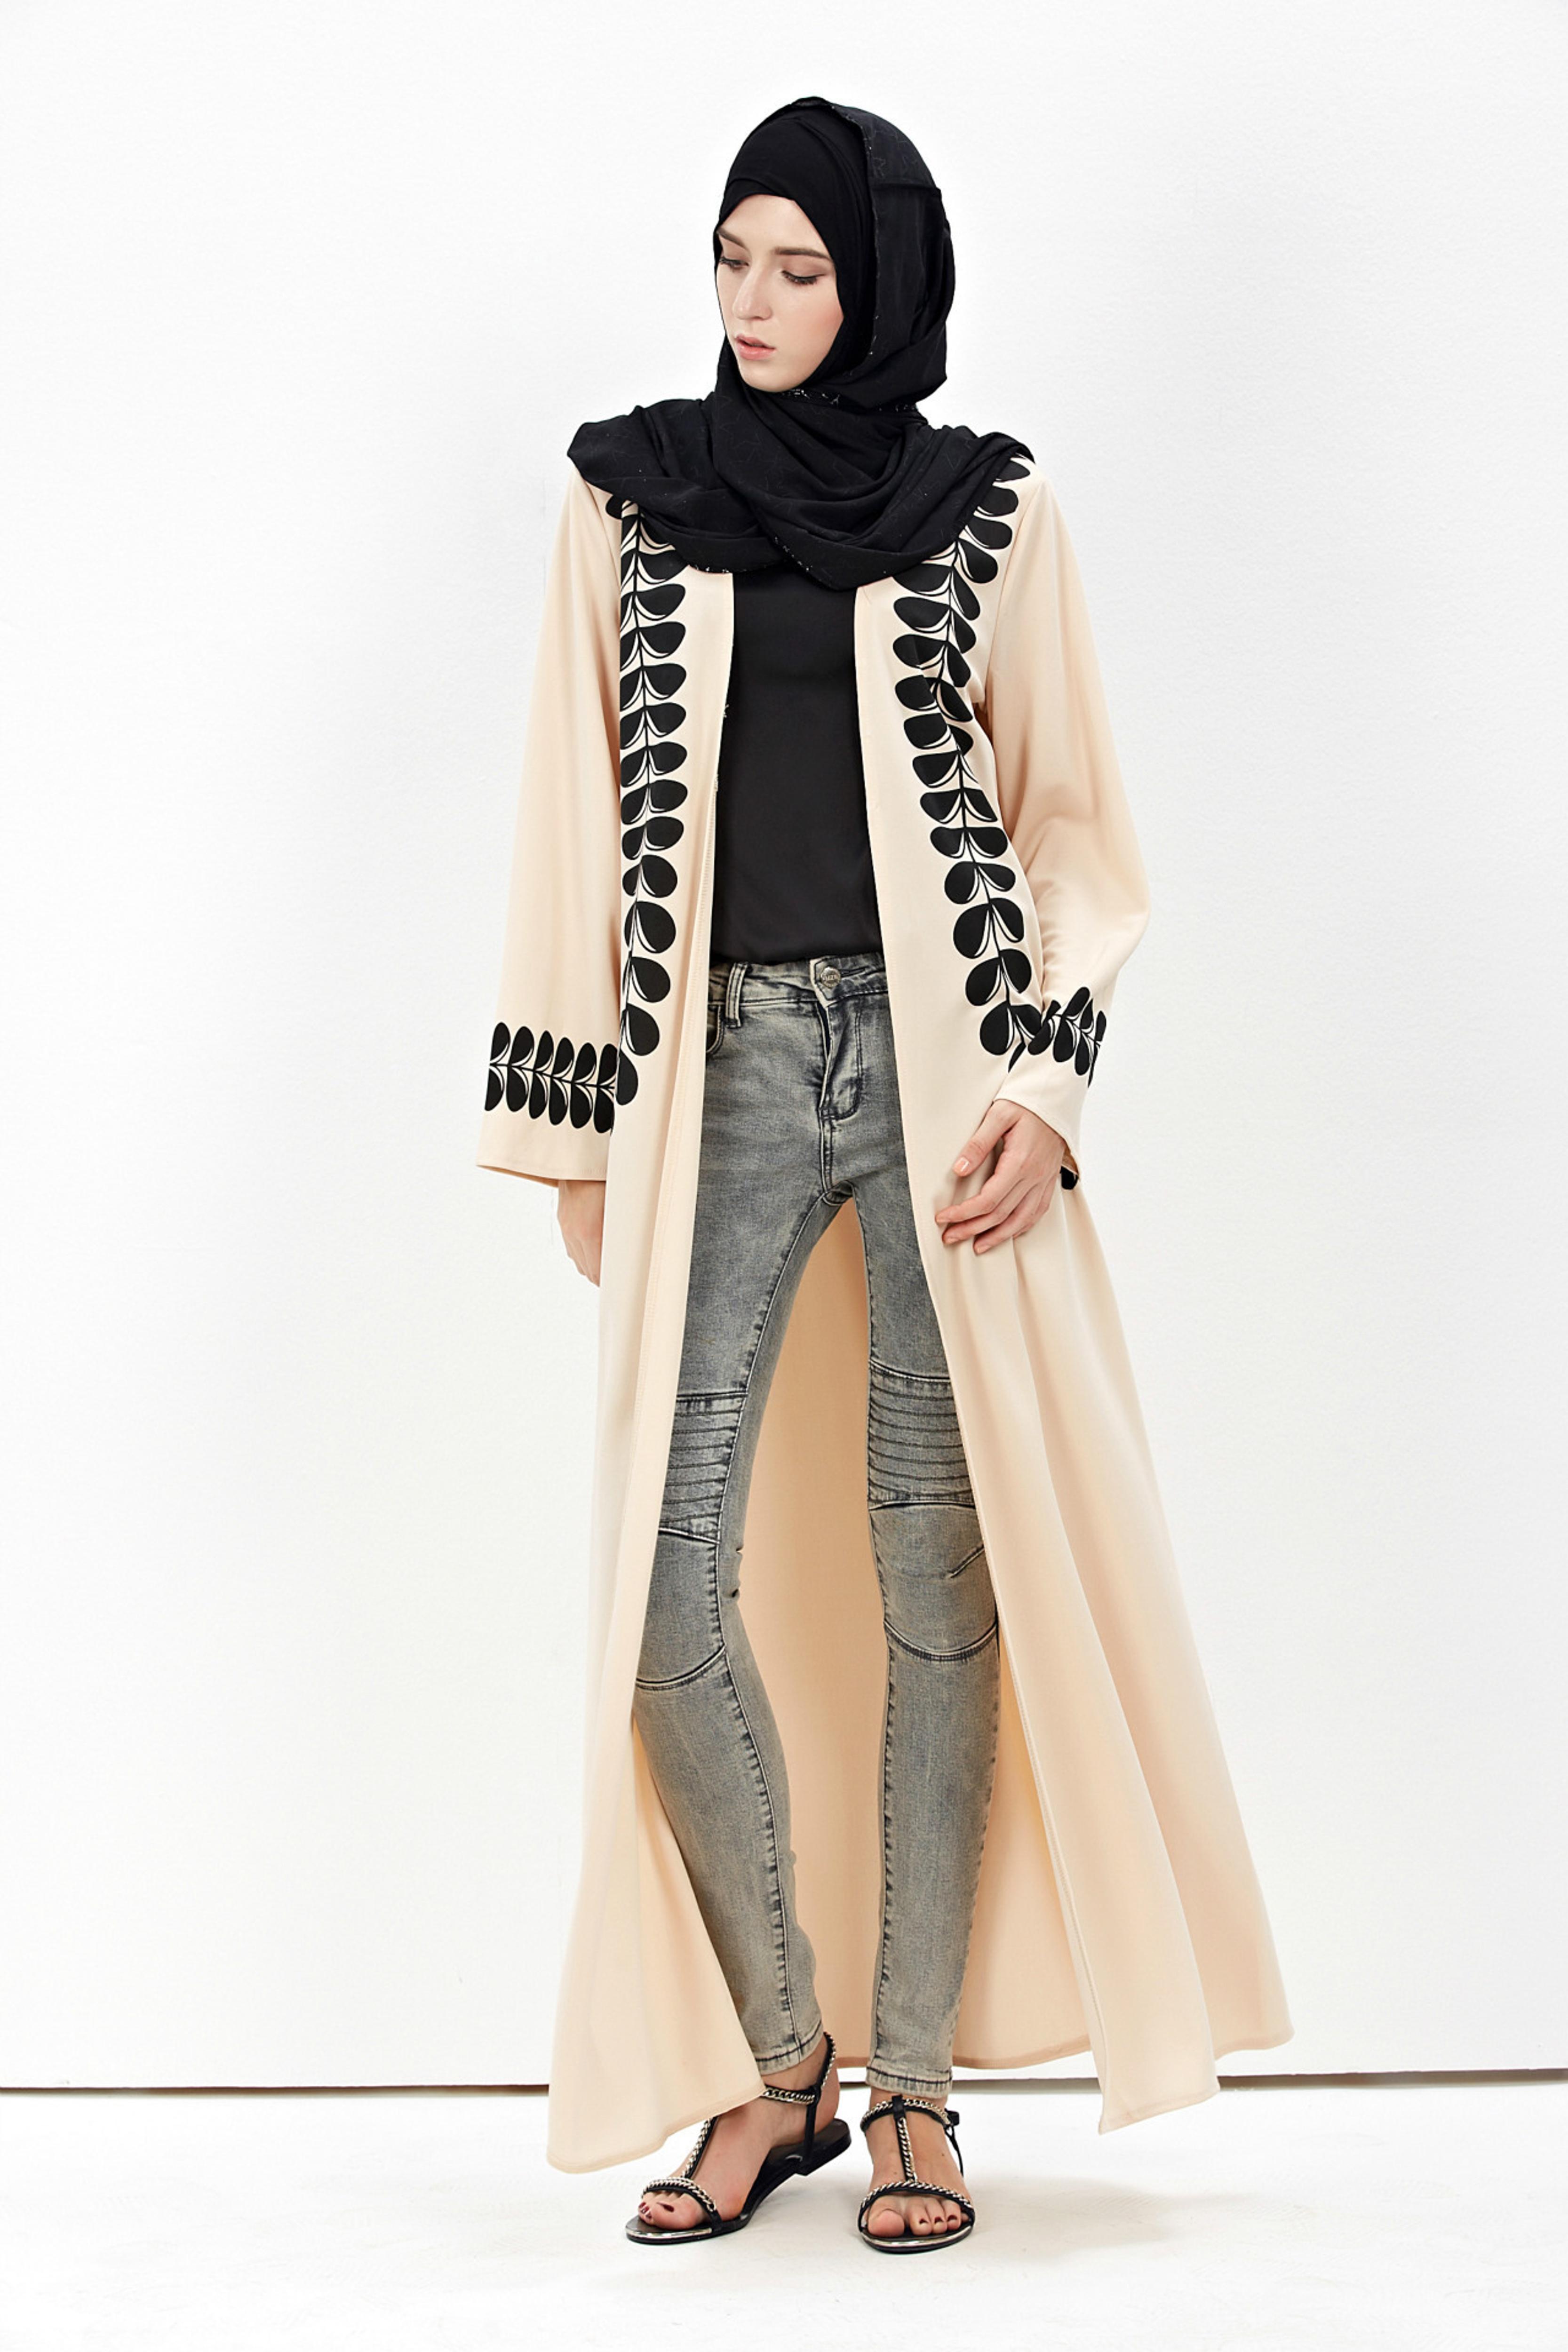 76026a6991e0 ᗕ2016 мусульманская кардиган djellaba Турецкая женская одежда ...